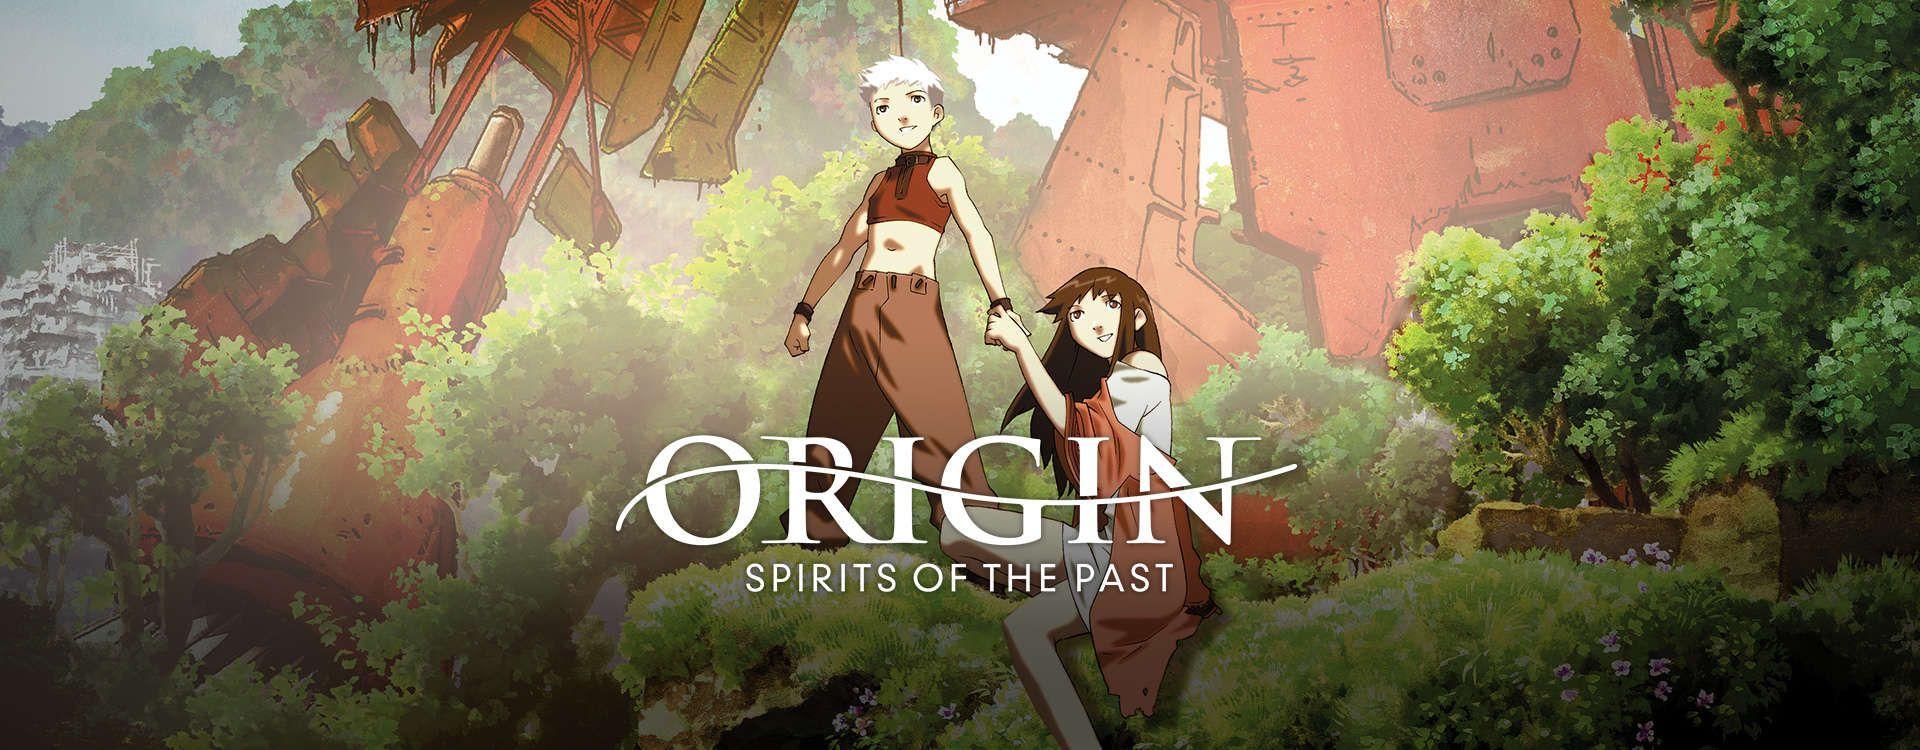 Origin Spirits of the Past.jpg